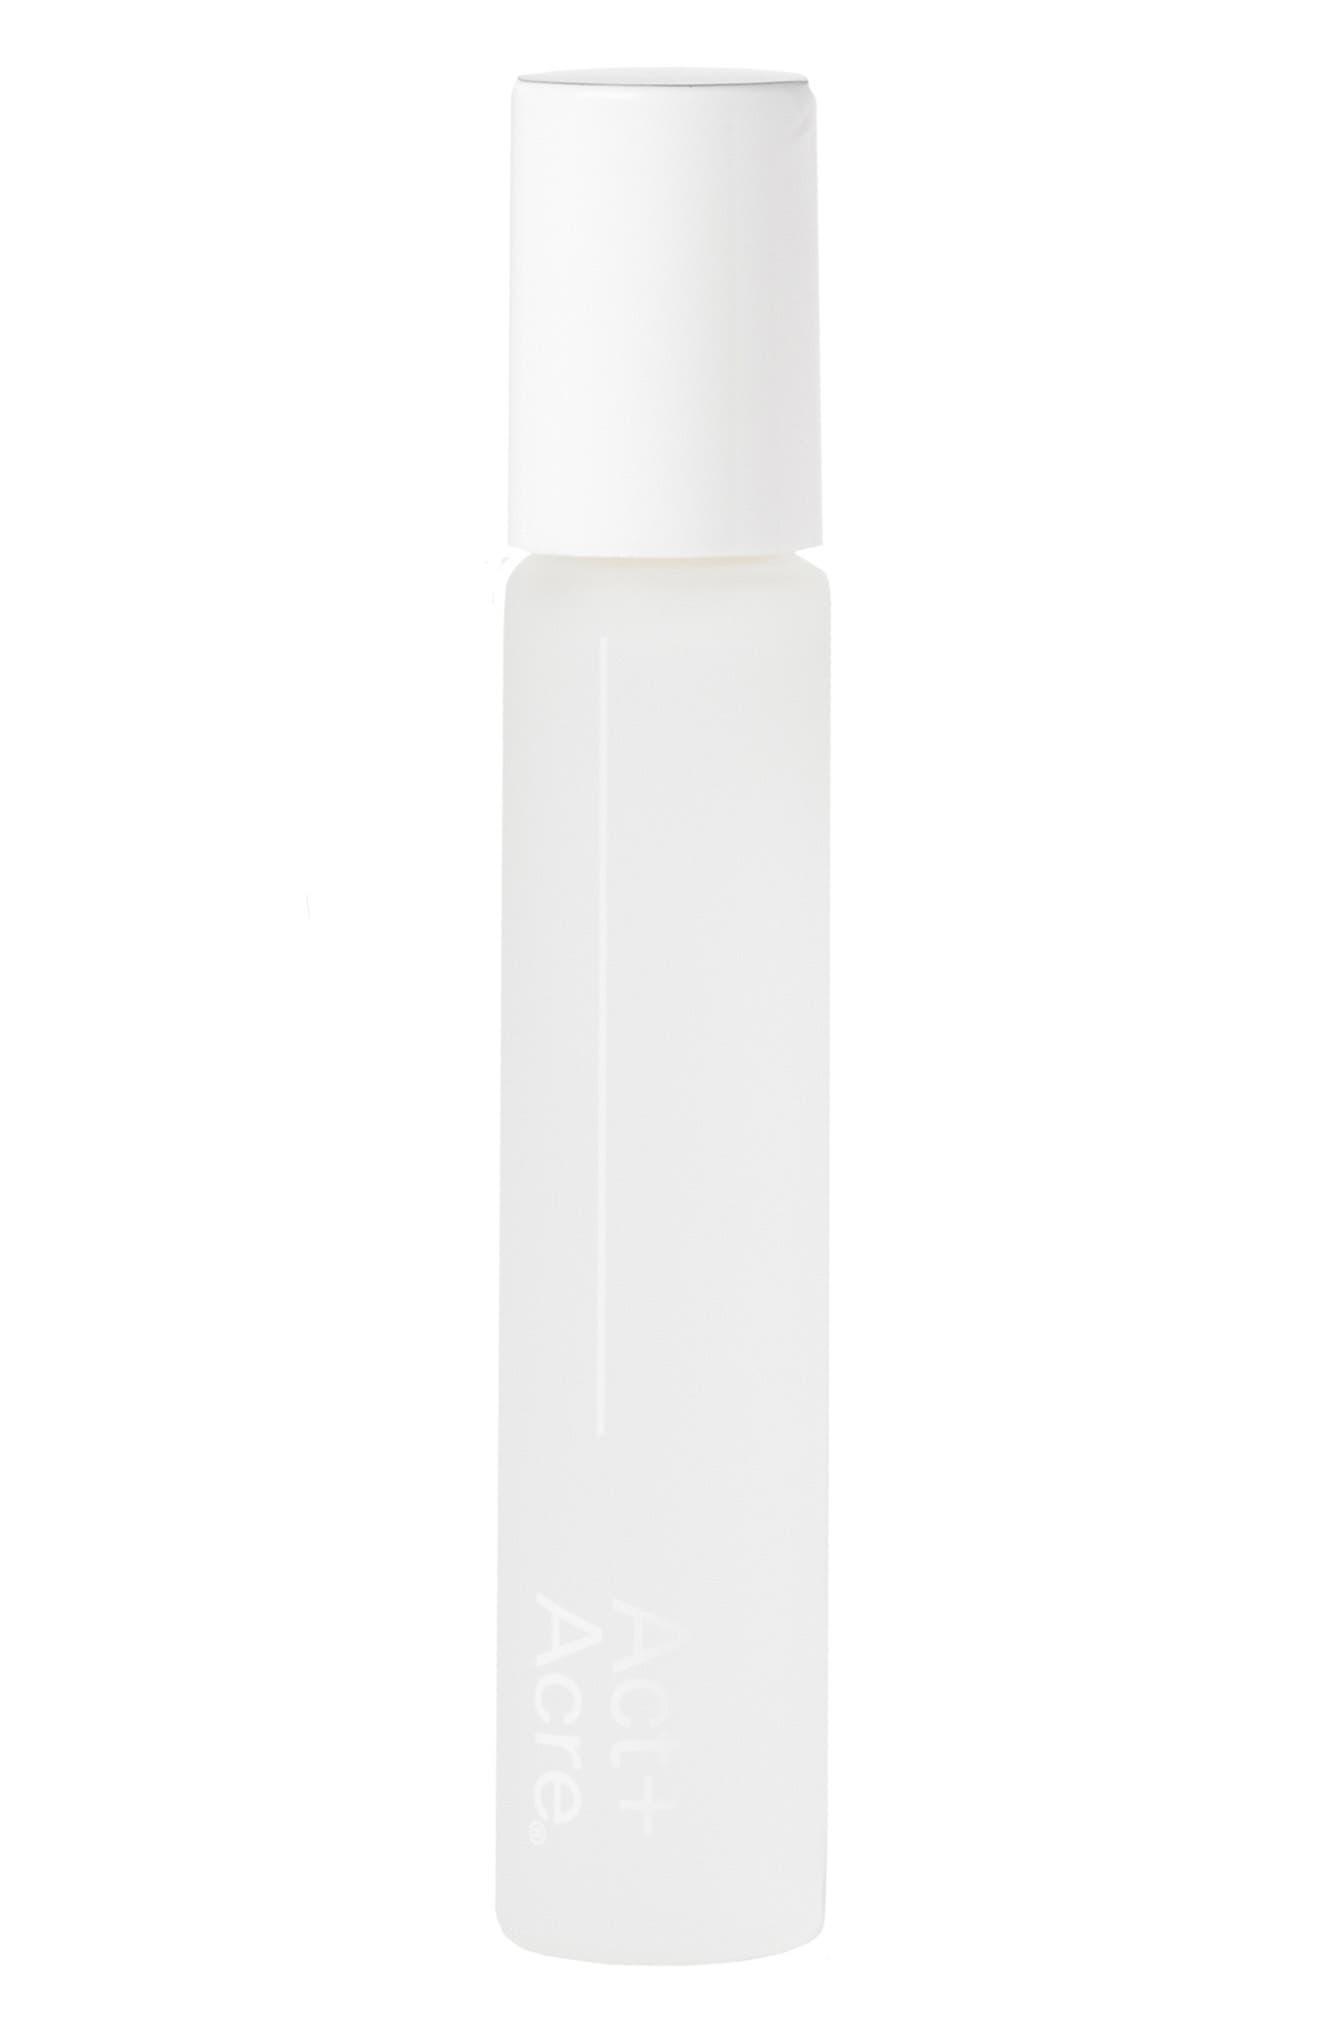 Act+Acre Rebalancing Scalp Fragrance Rollerball